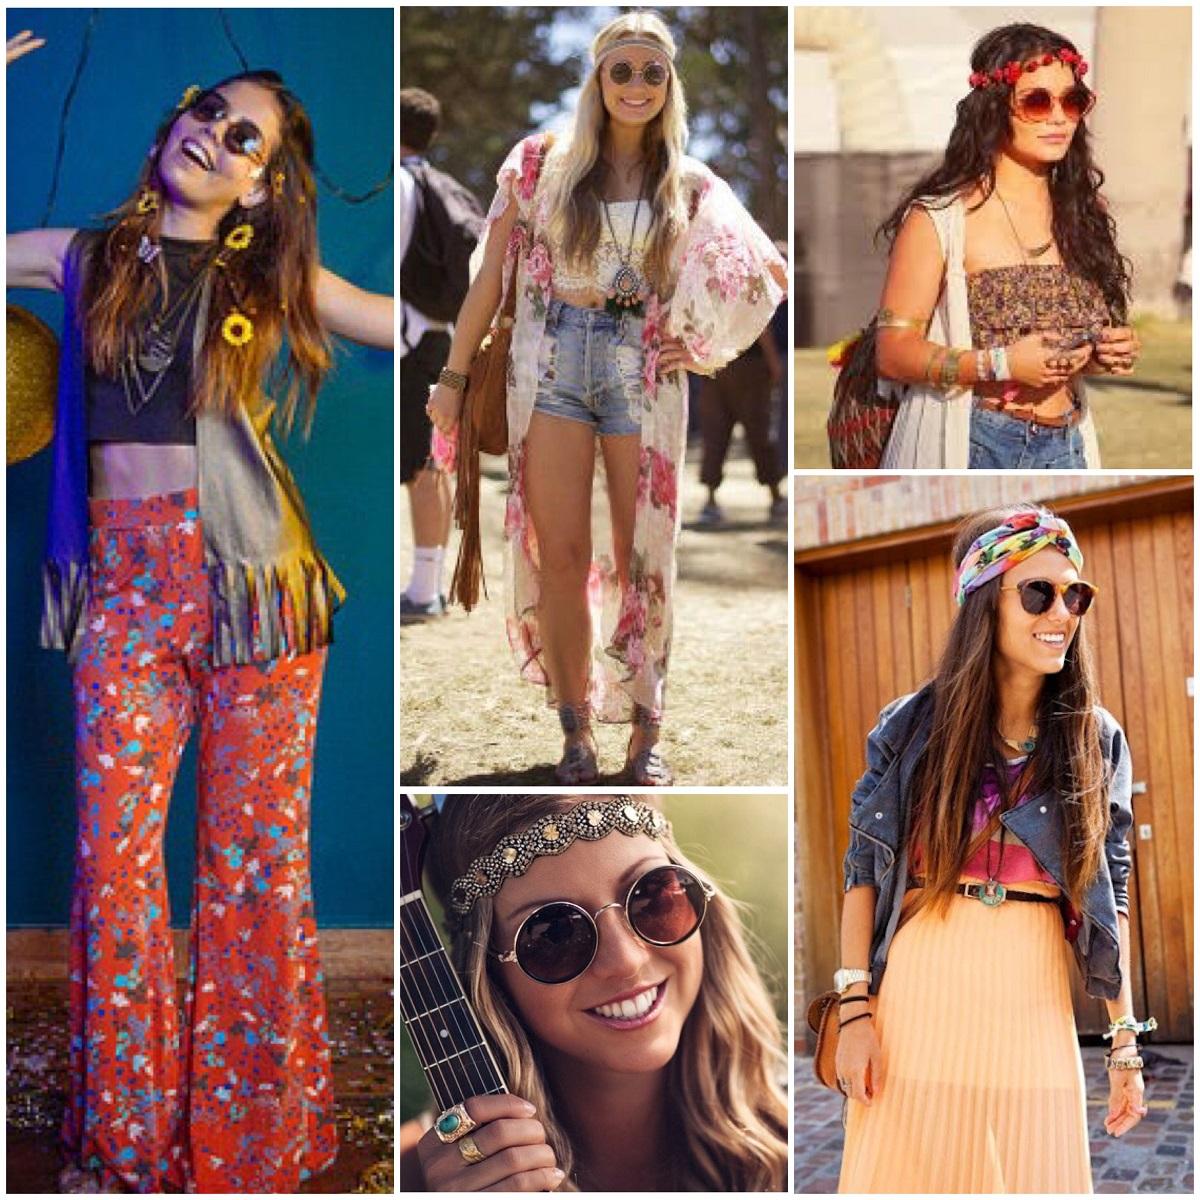 ideias de fantasia feminina para o carnaval de hippie